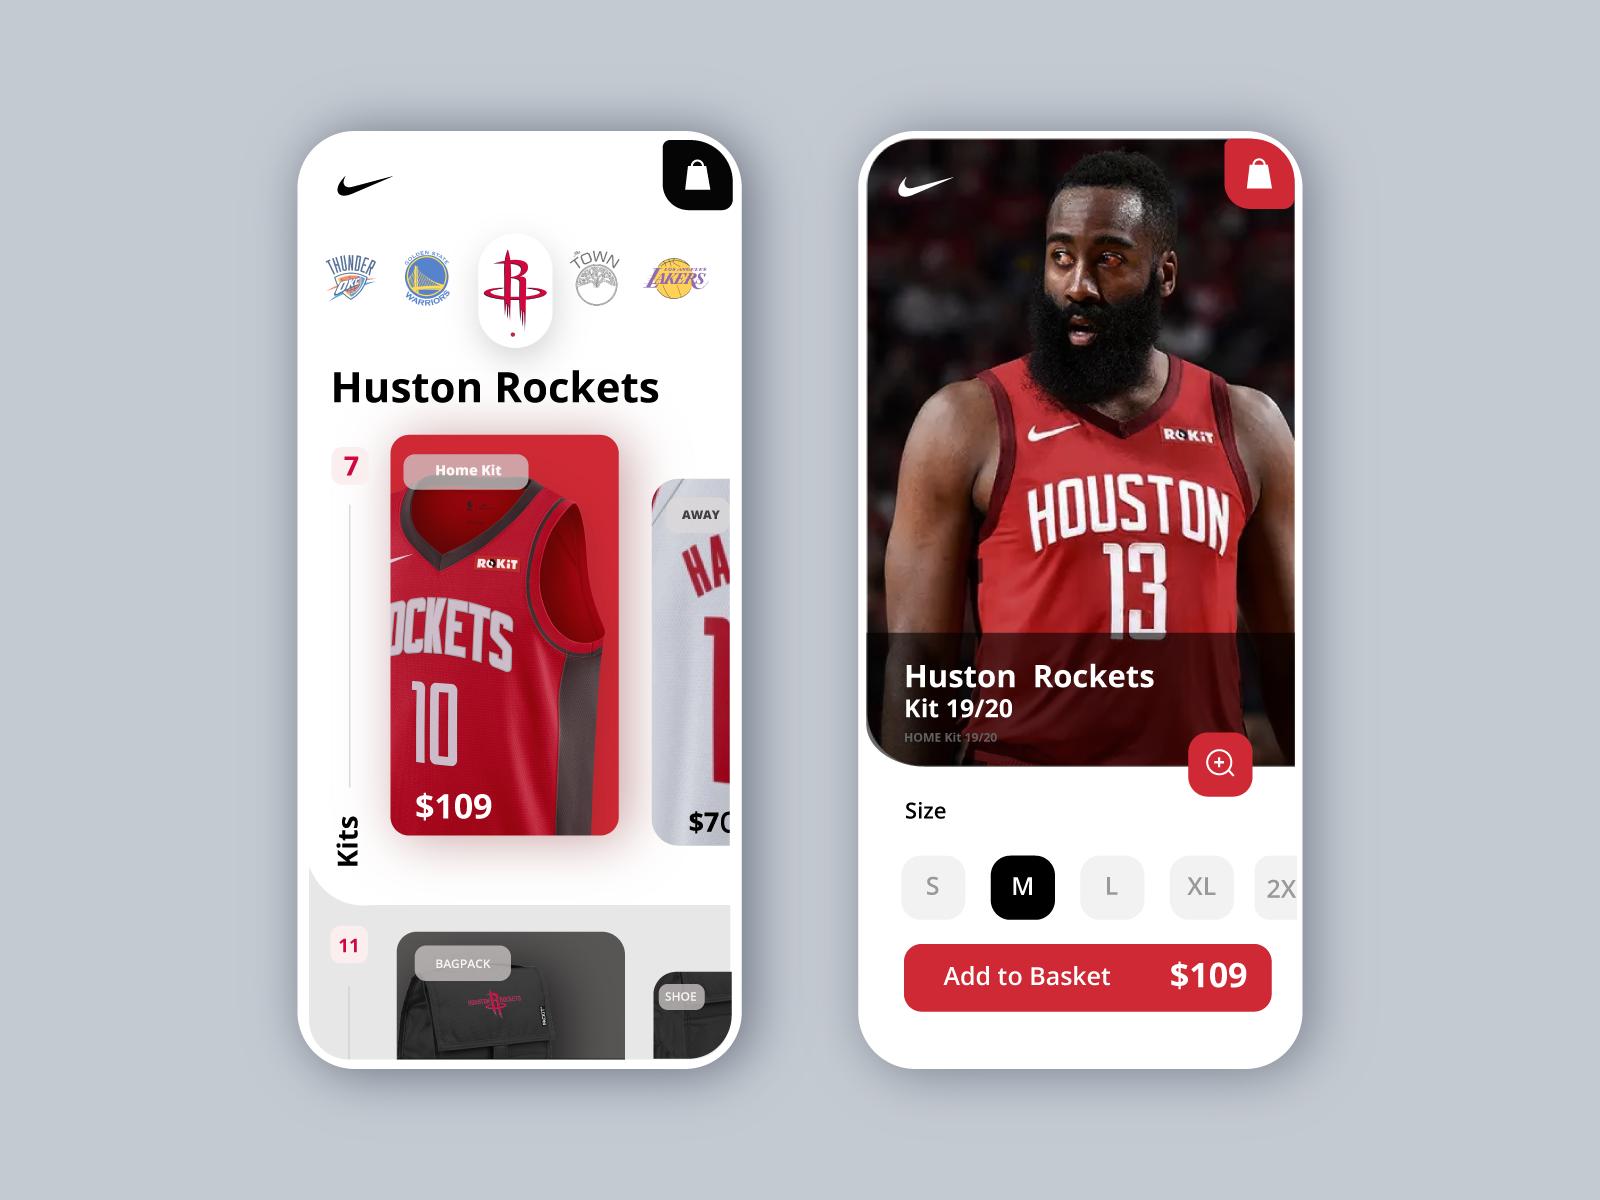 Al borde Habitar Asesorar  NBA - Nike - Shop App by Ikako Talavadze on Dribbble